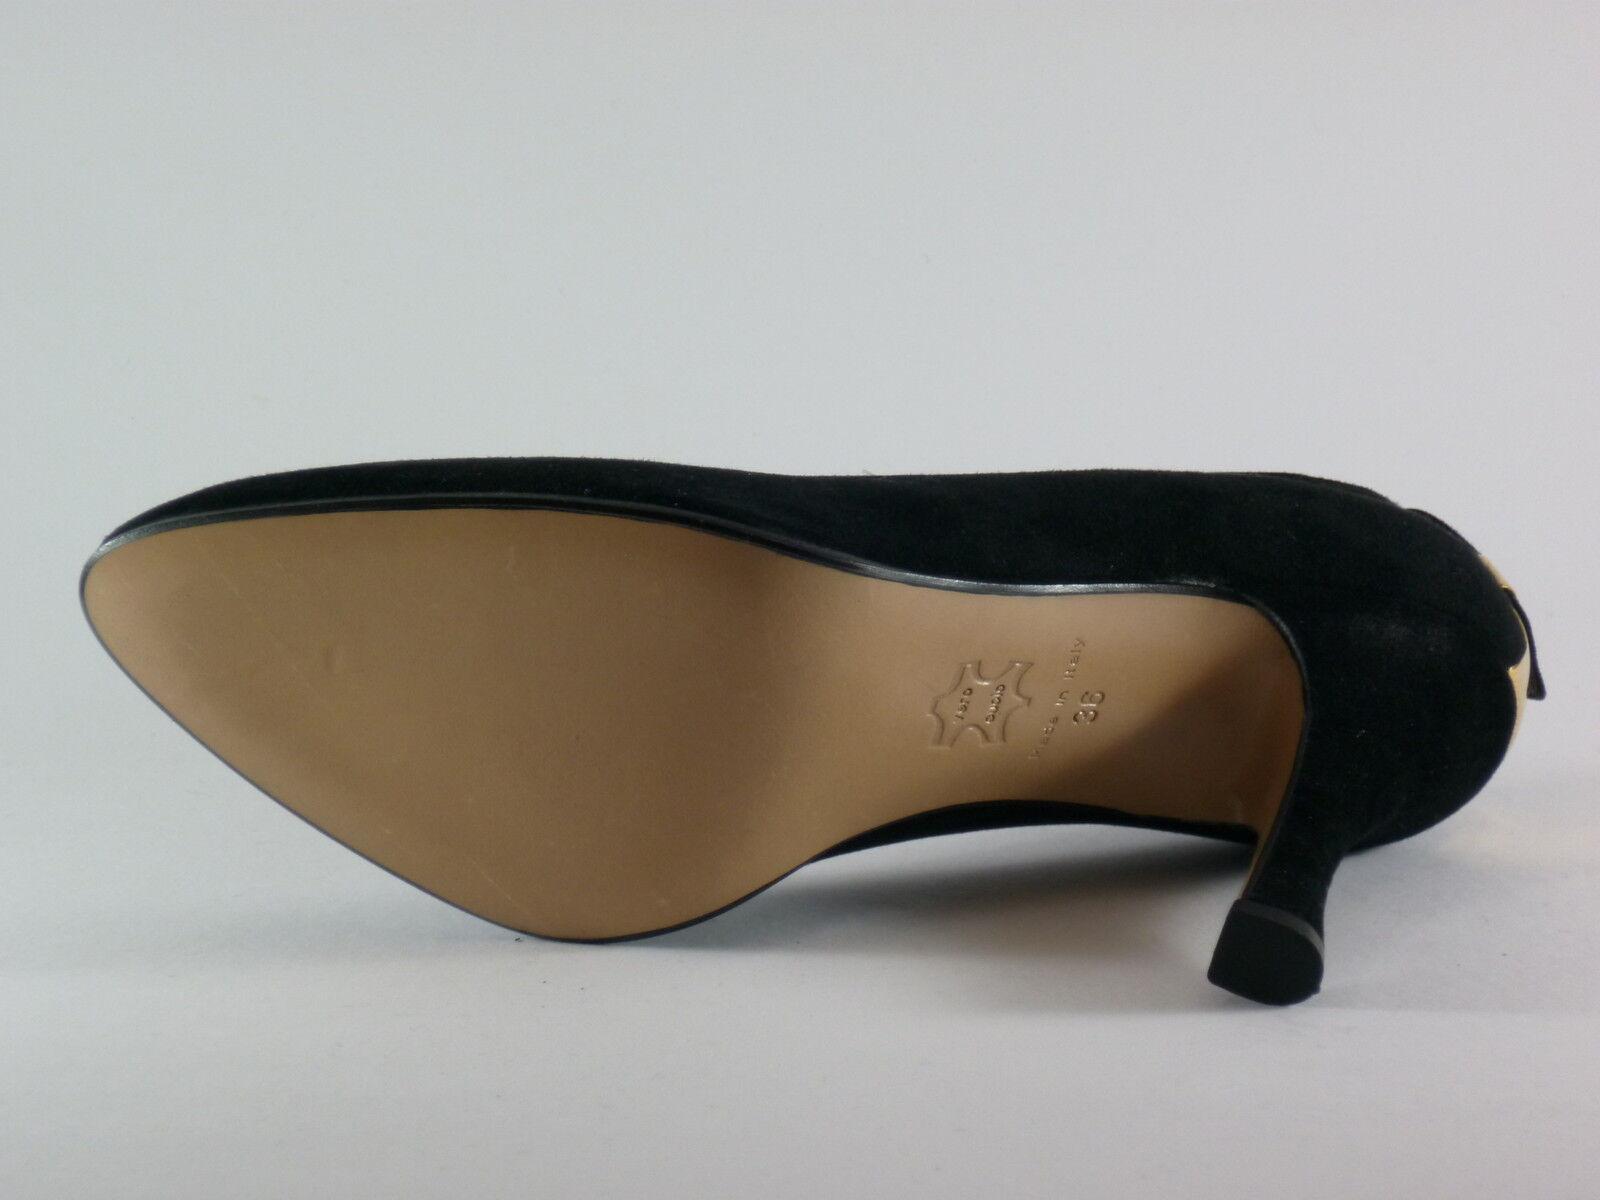 CUSANO Damen Schuhe 36 Pumps 40 Velour Schwarz Pumps 36 NEU 1725f6